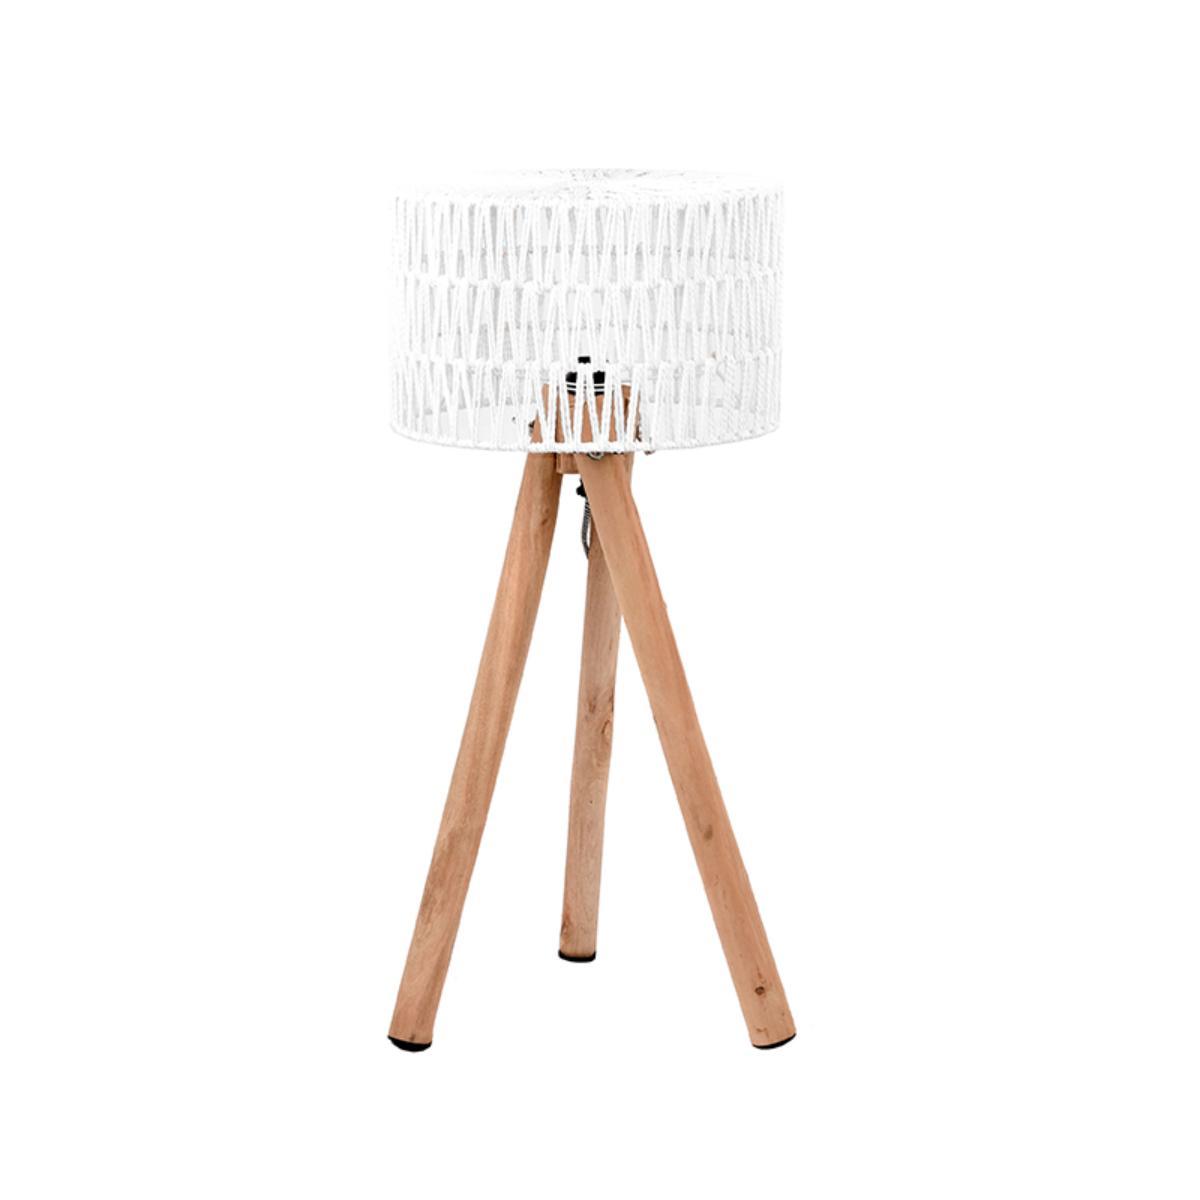 LABEL51 Tafellamp Stripe - Wit - Mangohout